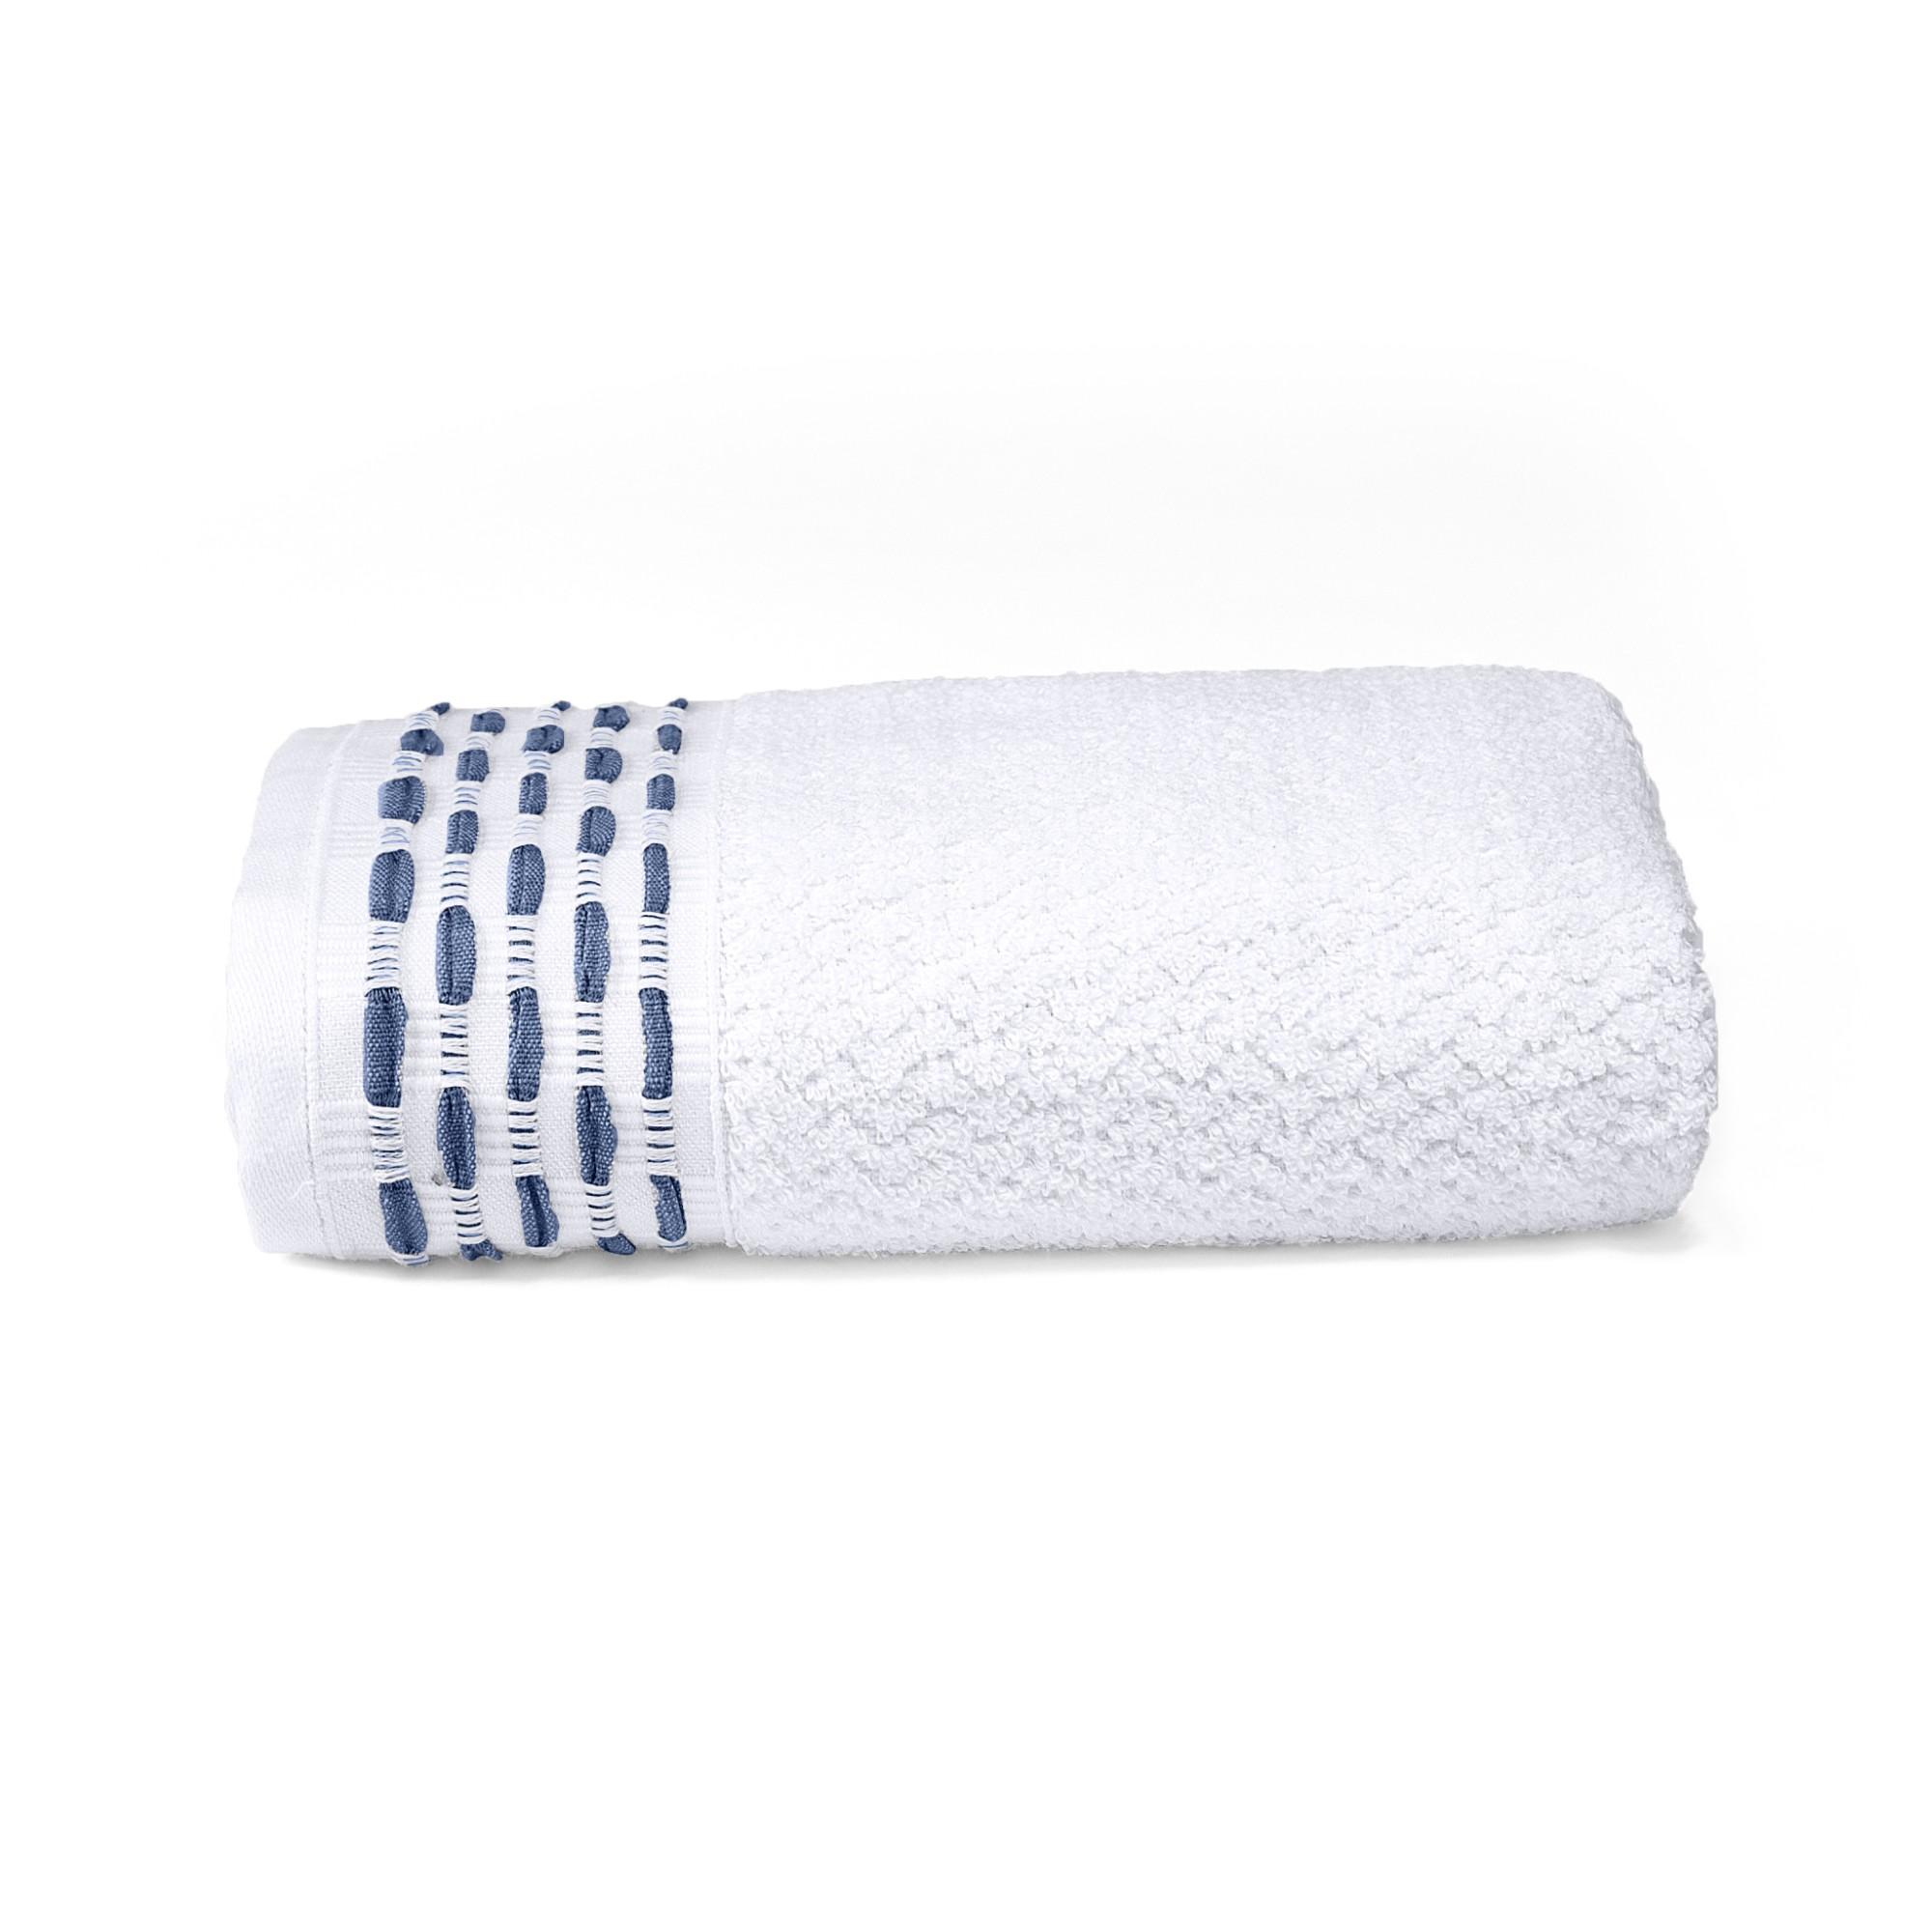 Toalha de Rosto Oxford 100 Algodao 50 x 80 cm Branca - 63620 - Buettner